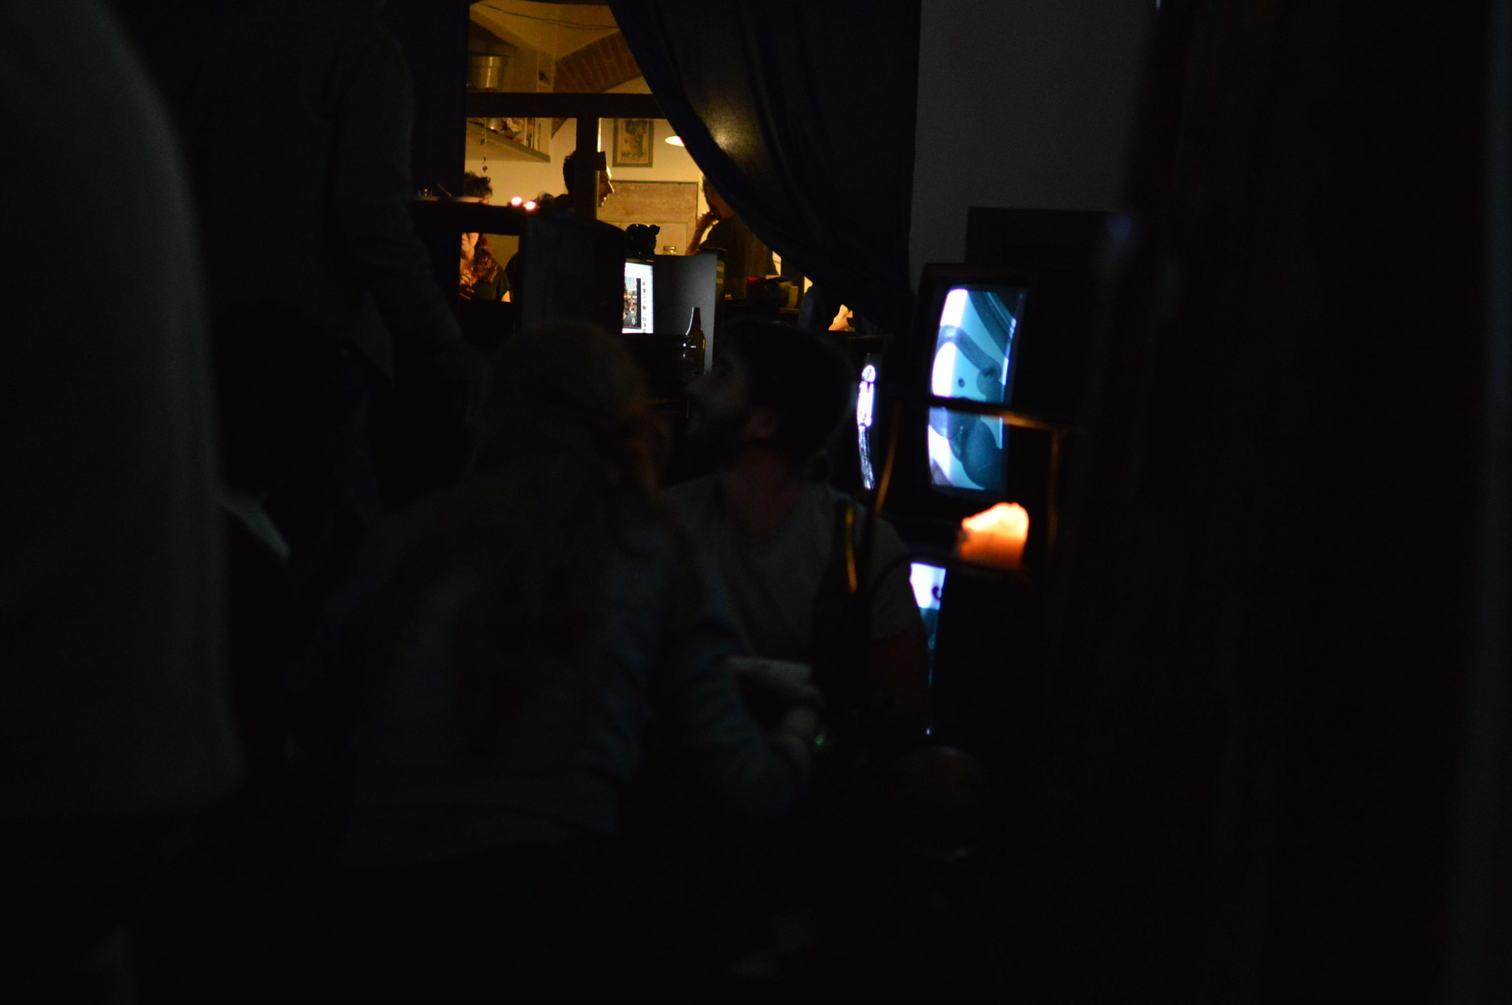 IlGattaRossa - 15 Apr 2015 - I Mangiatori Di Teste - DSC_0379